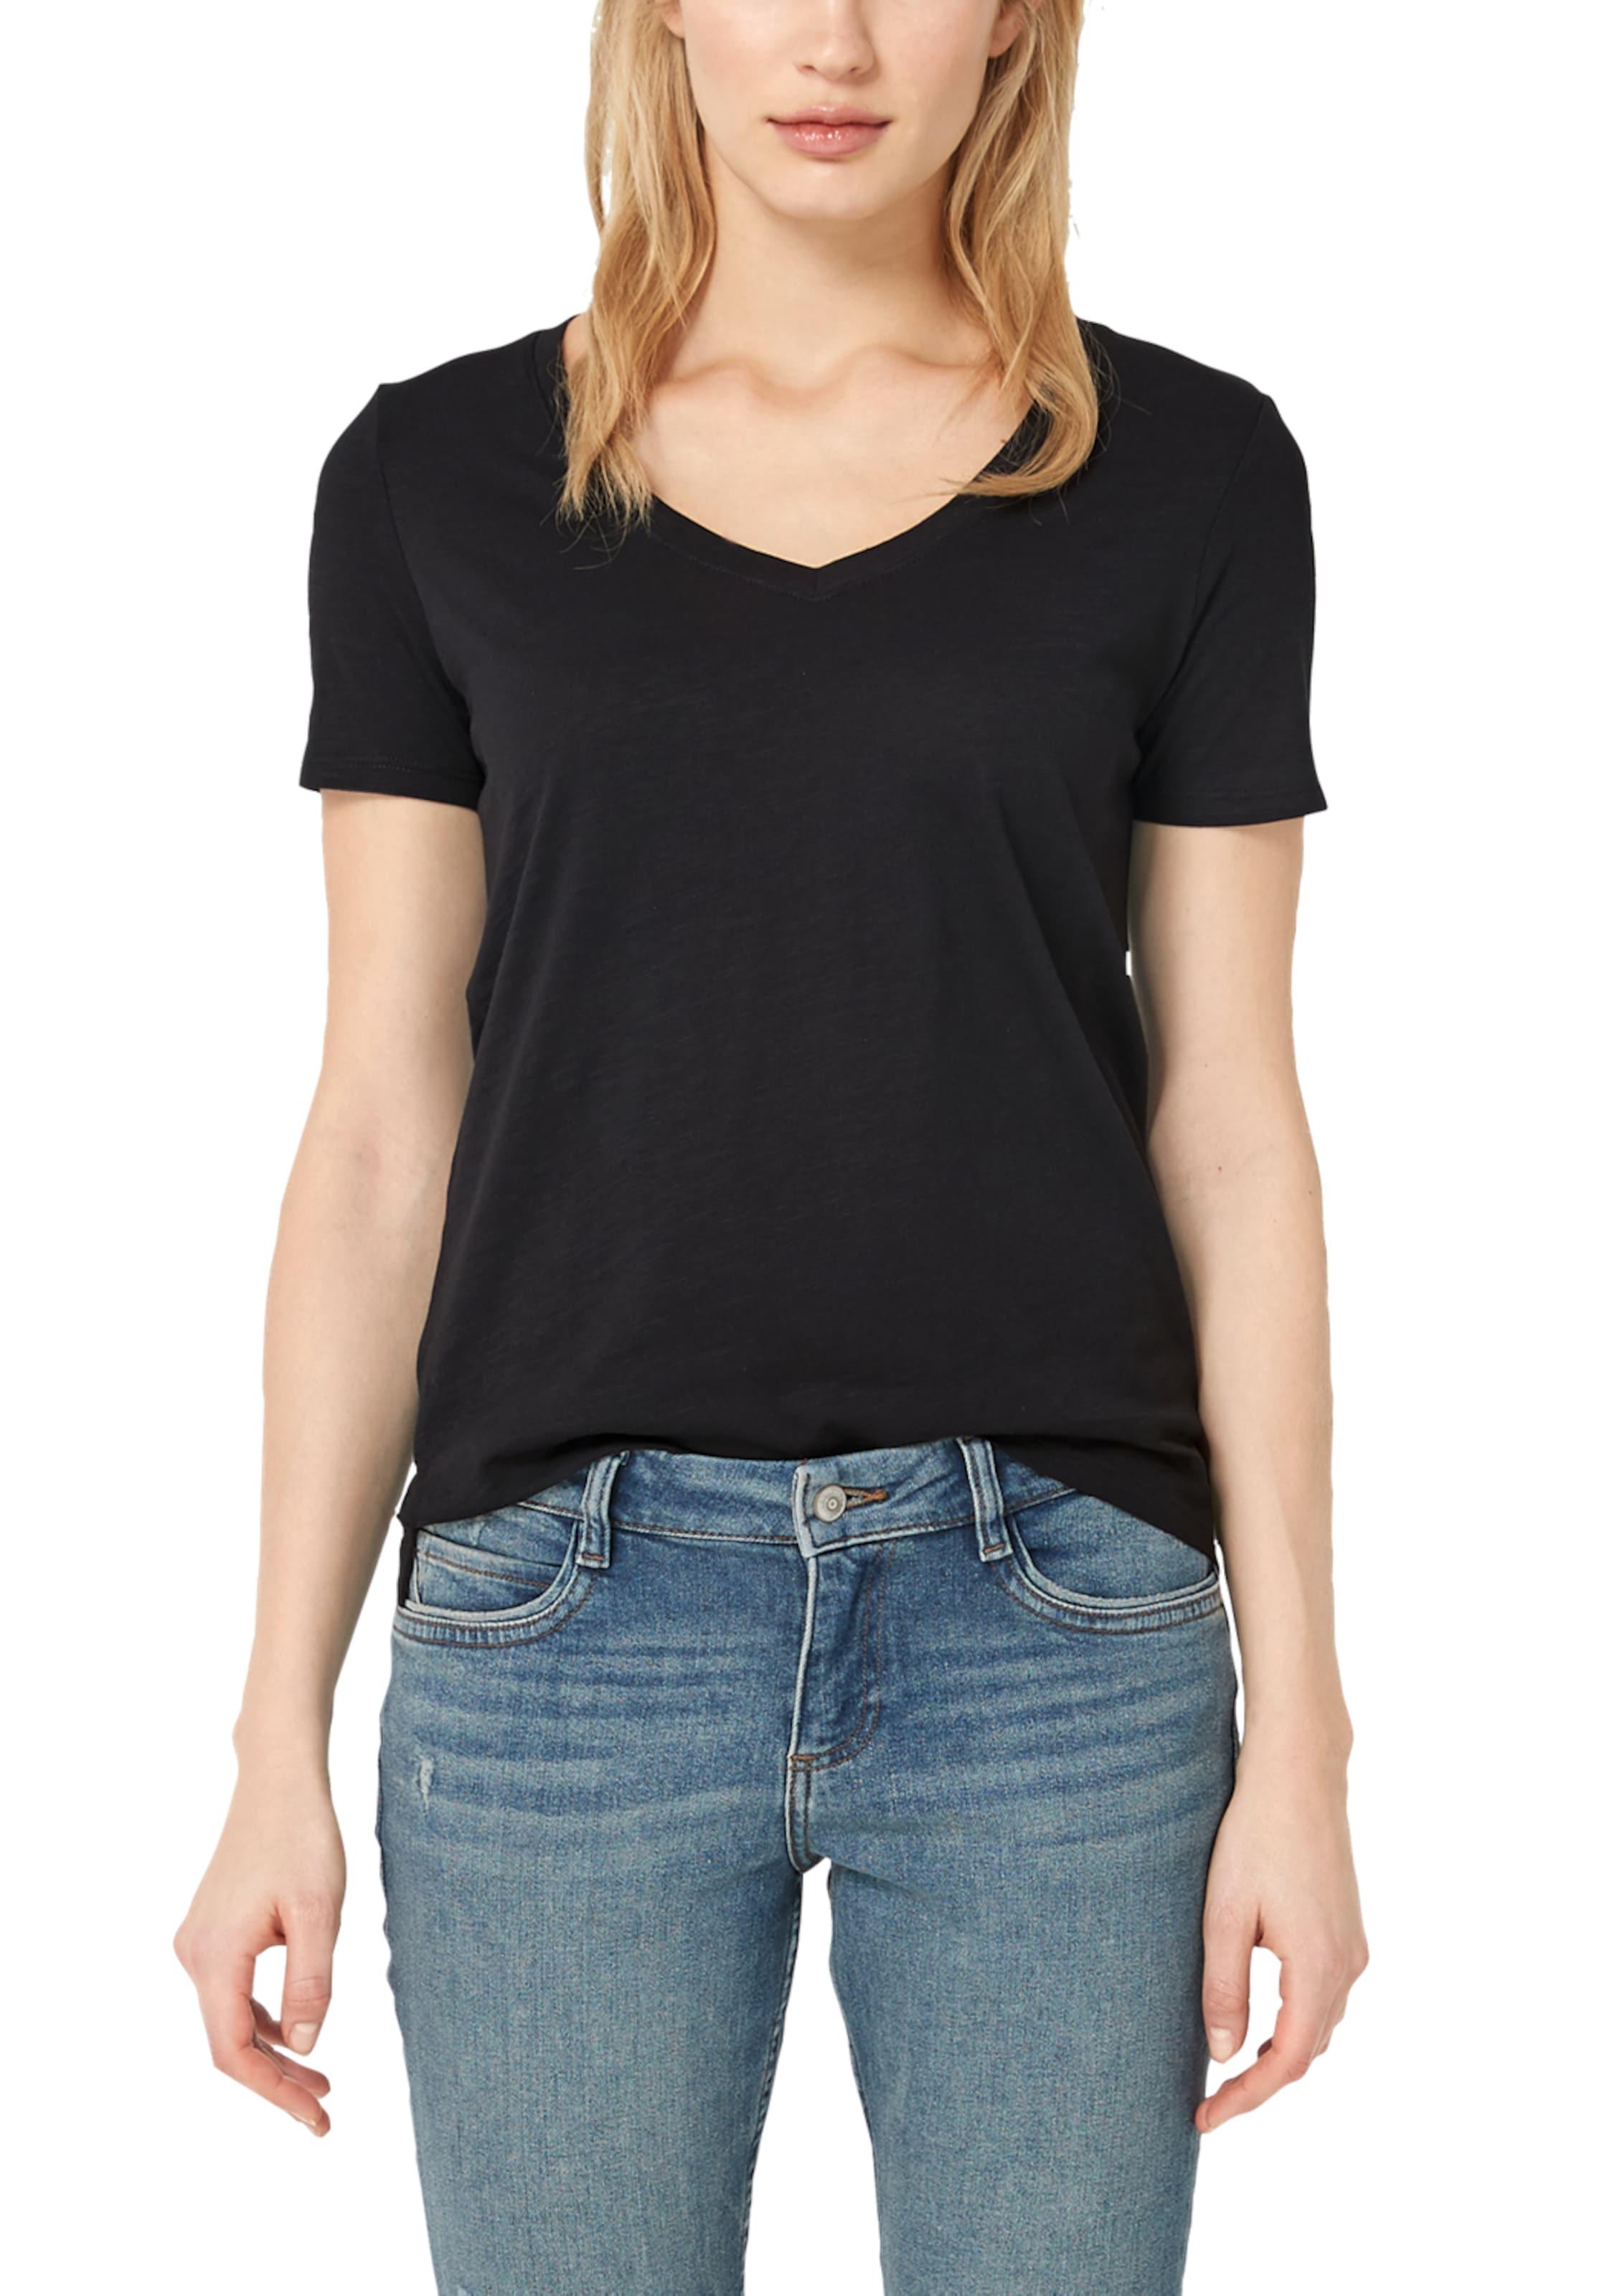 In Schwarz Red Label S oliver Shirt K1JcTlF